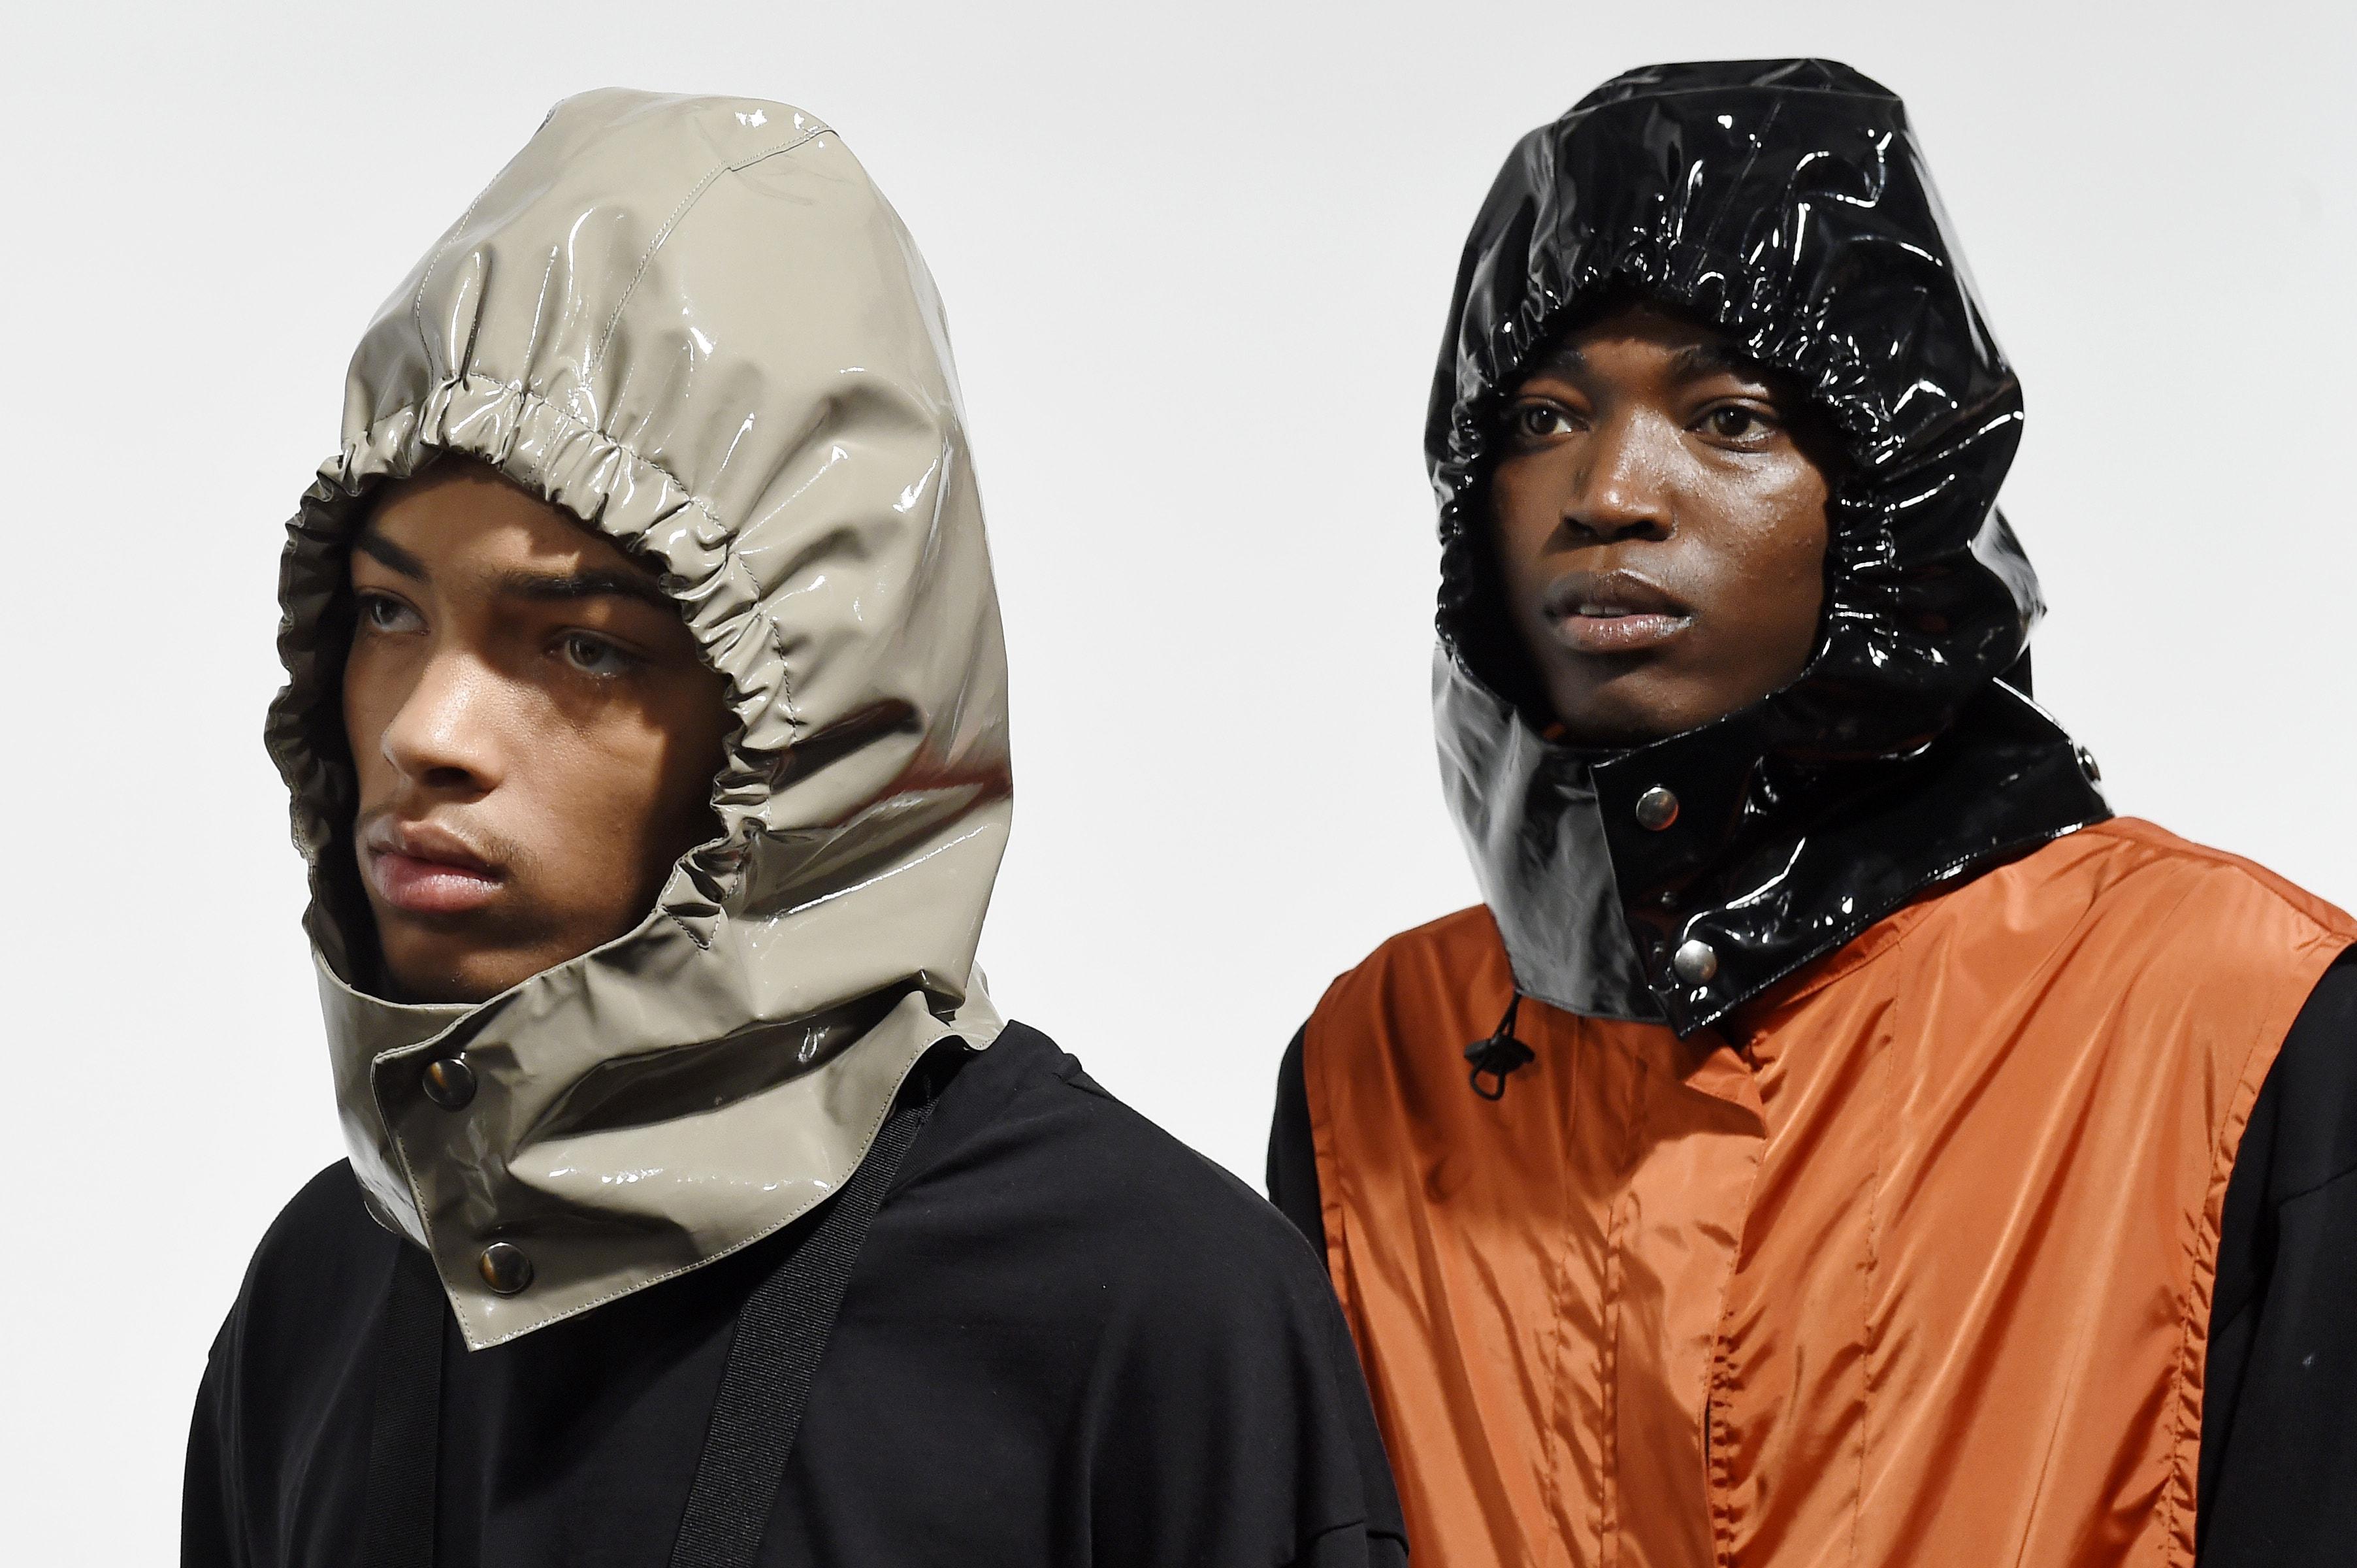 A-Cold-Wall show, Backstage, Fall Winter 2018, London Fashion Week Men's, UK - 08 Jan 2018